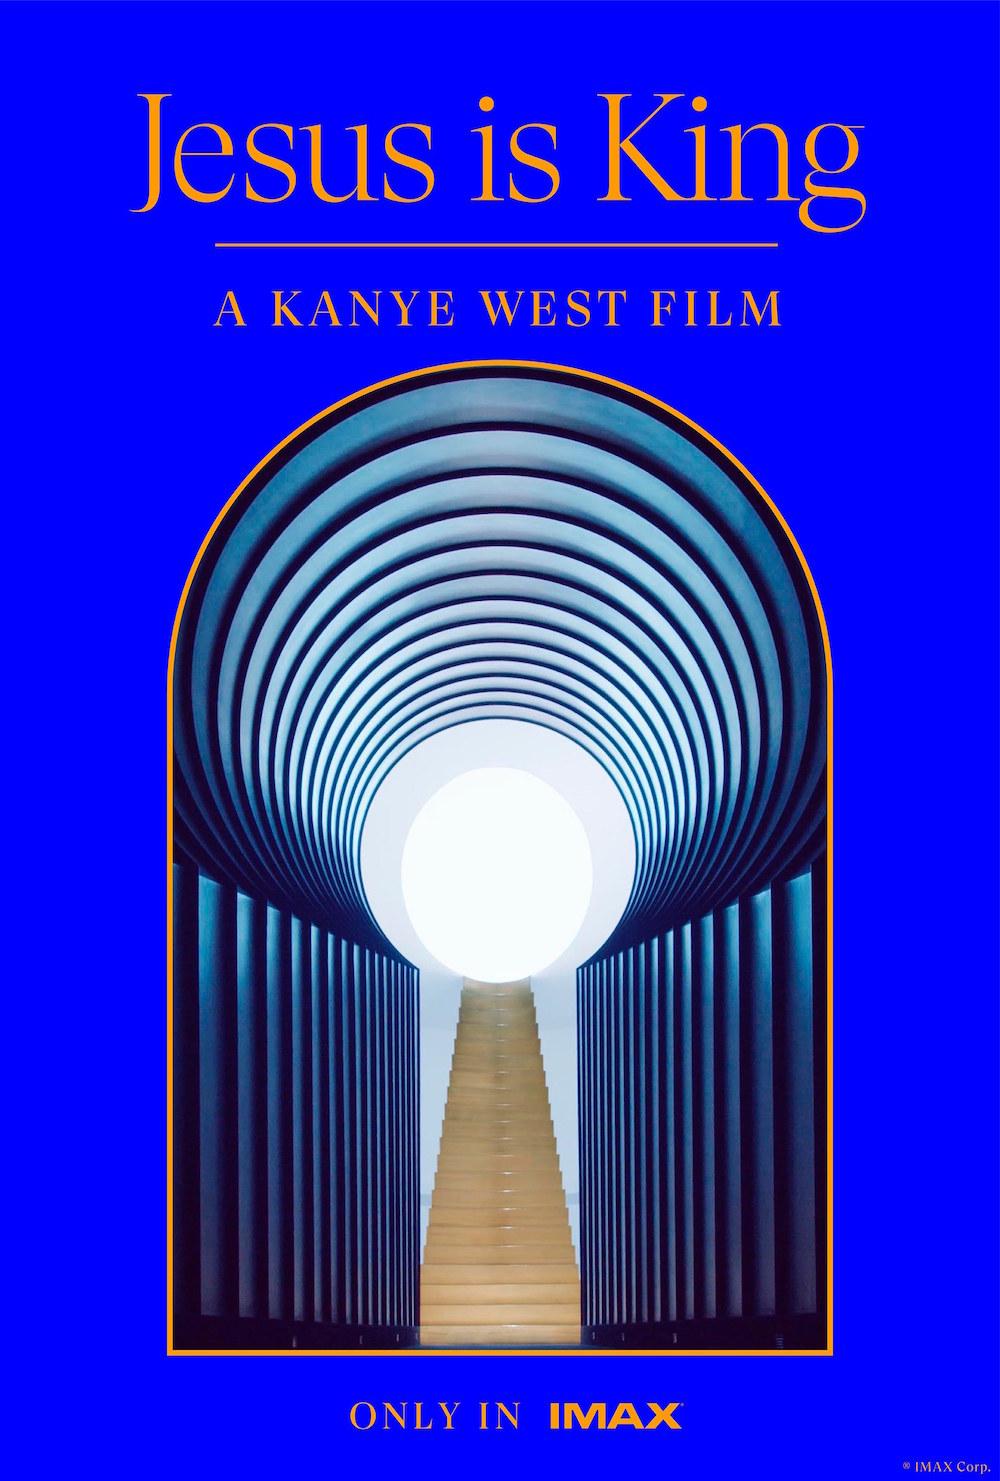 Jesus is King Poster Kanye West